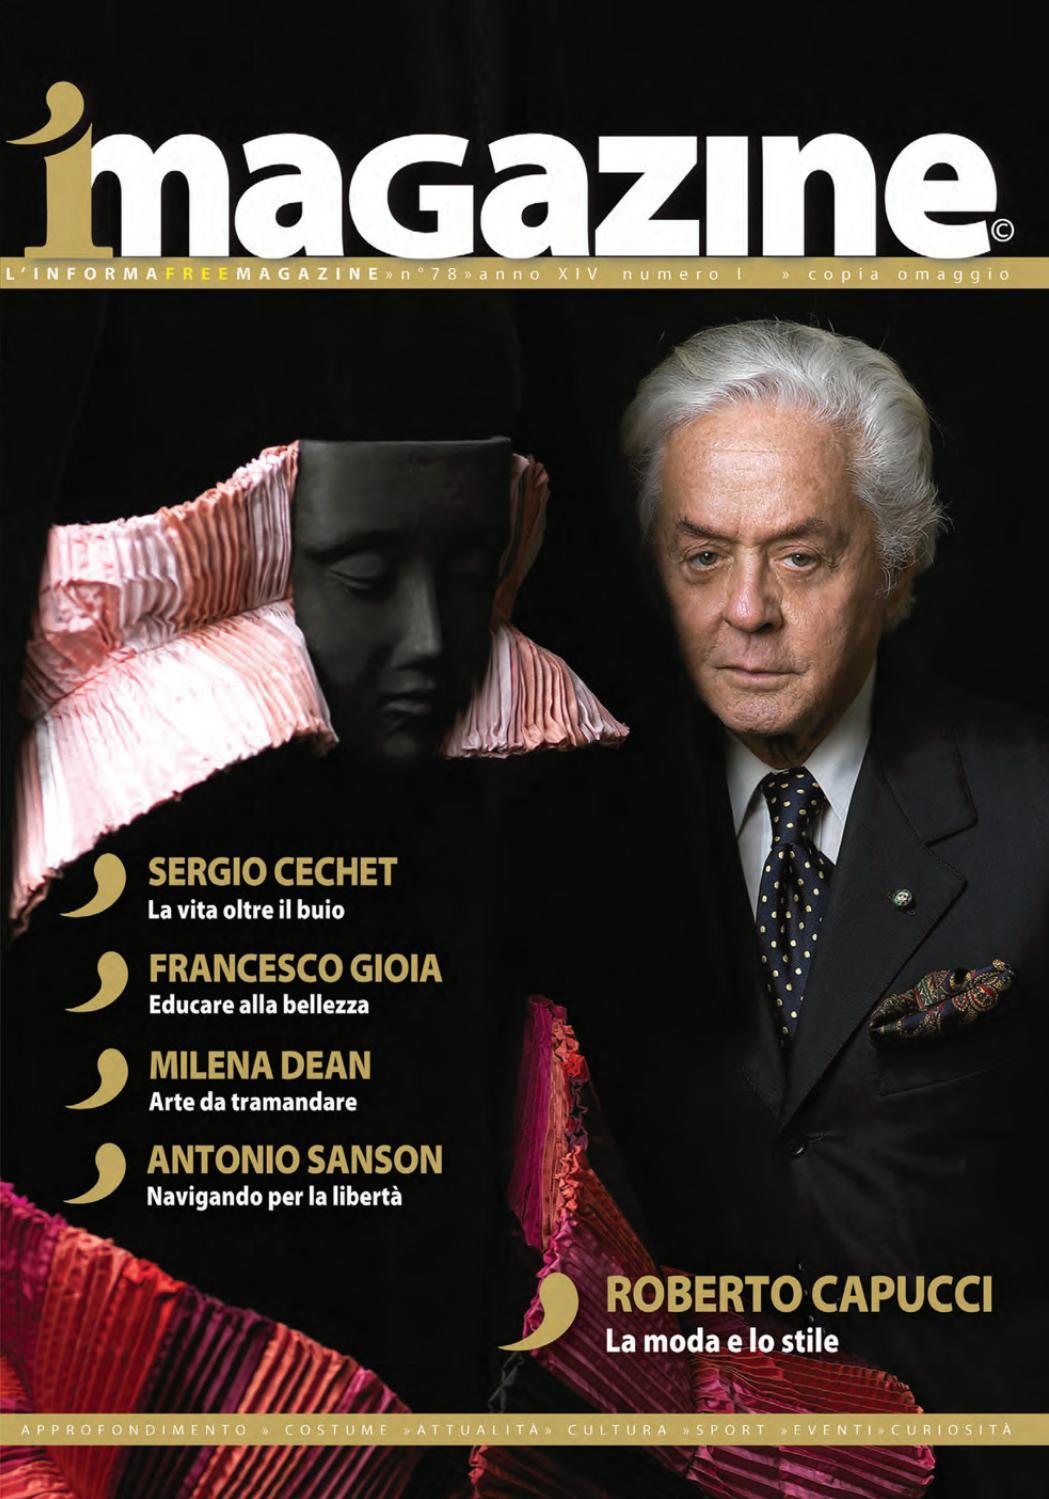 iMagazine V2y by Andrea Zuttion - issuu 598b5c0582cf